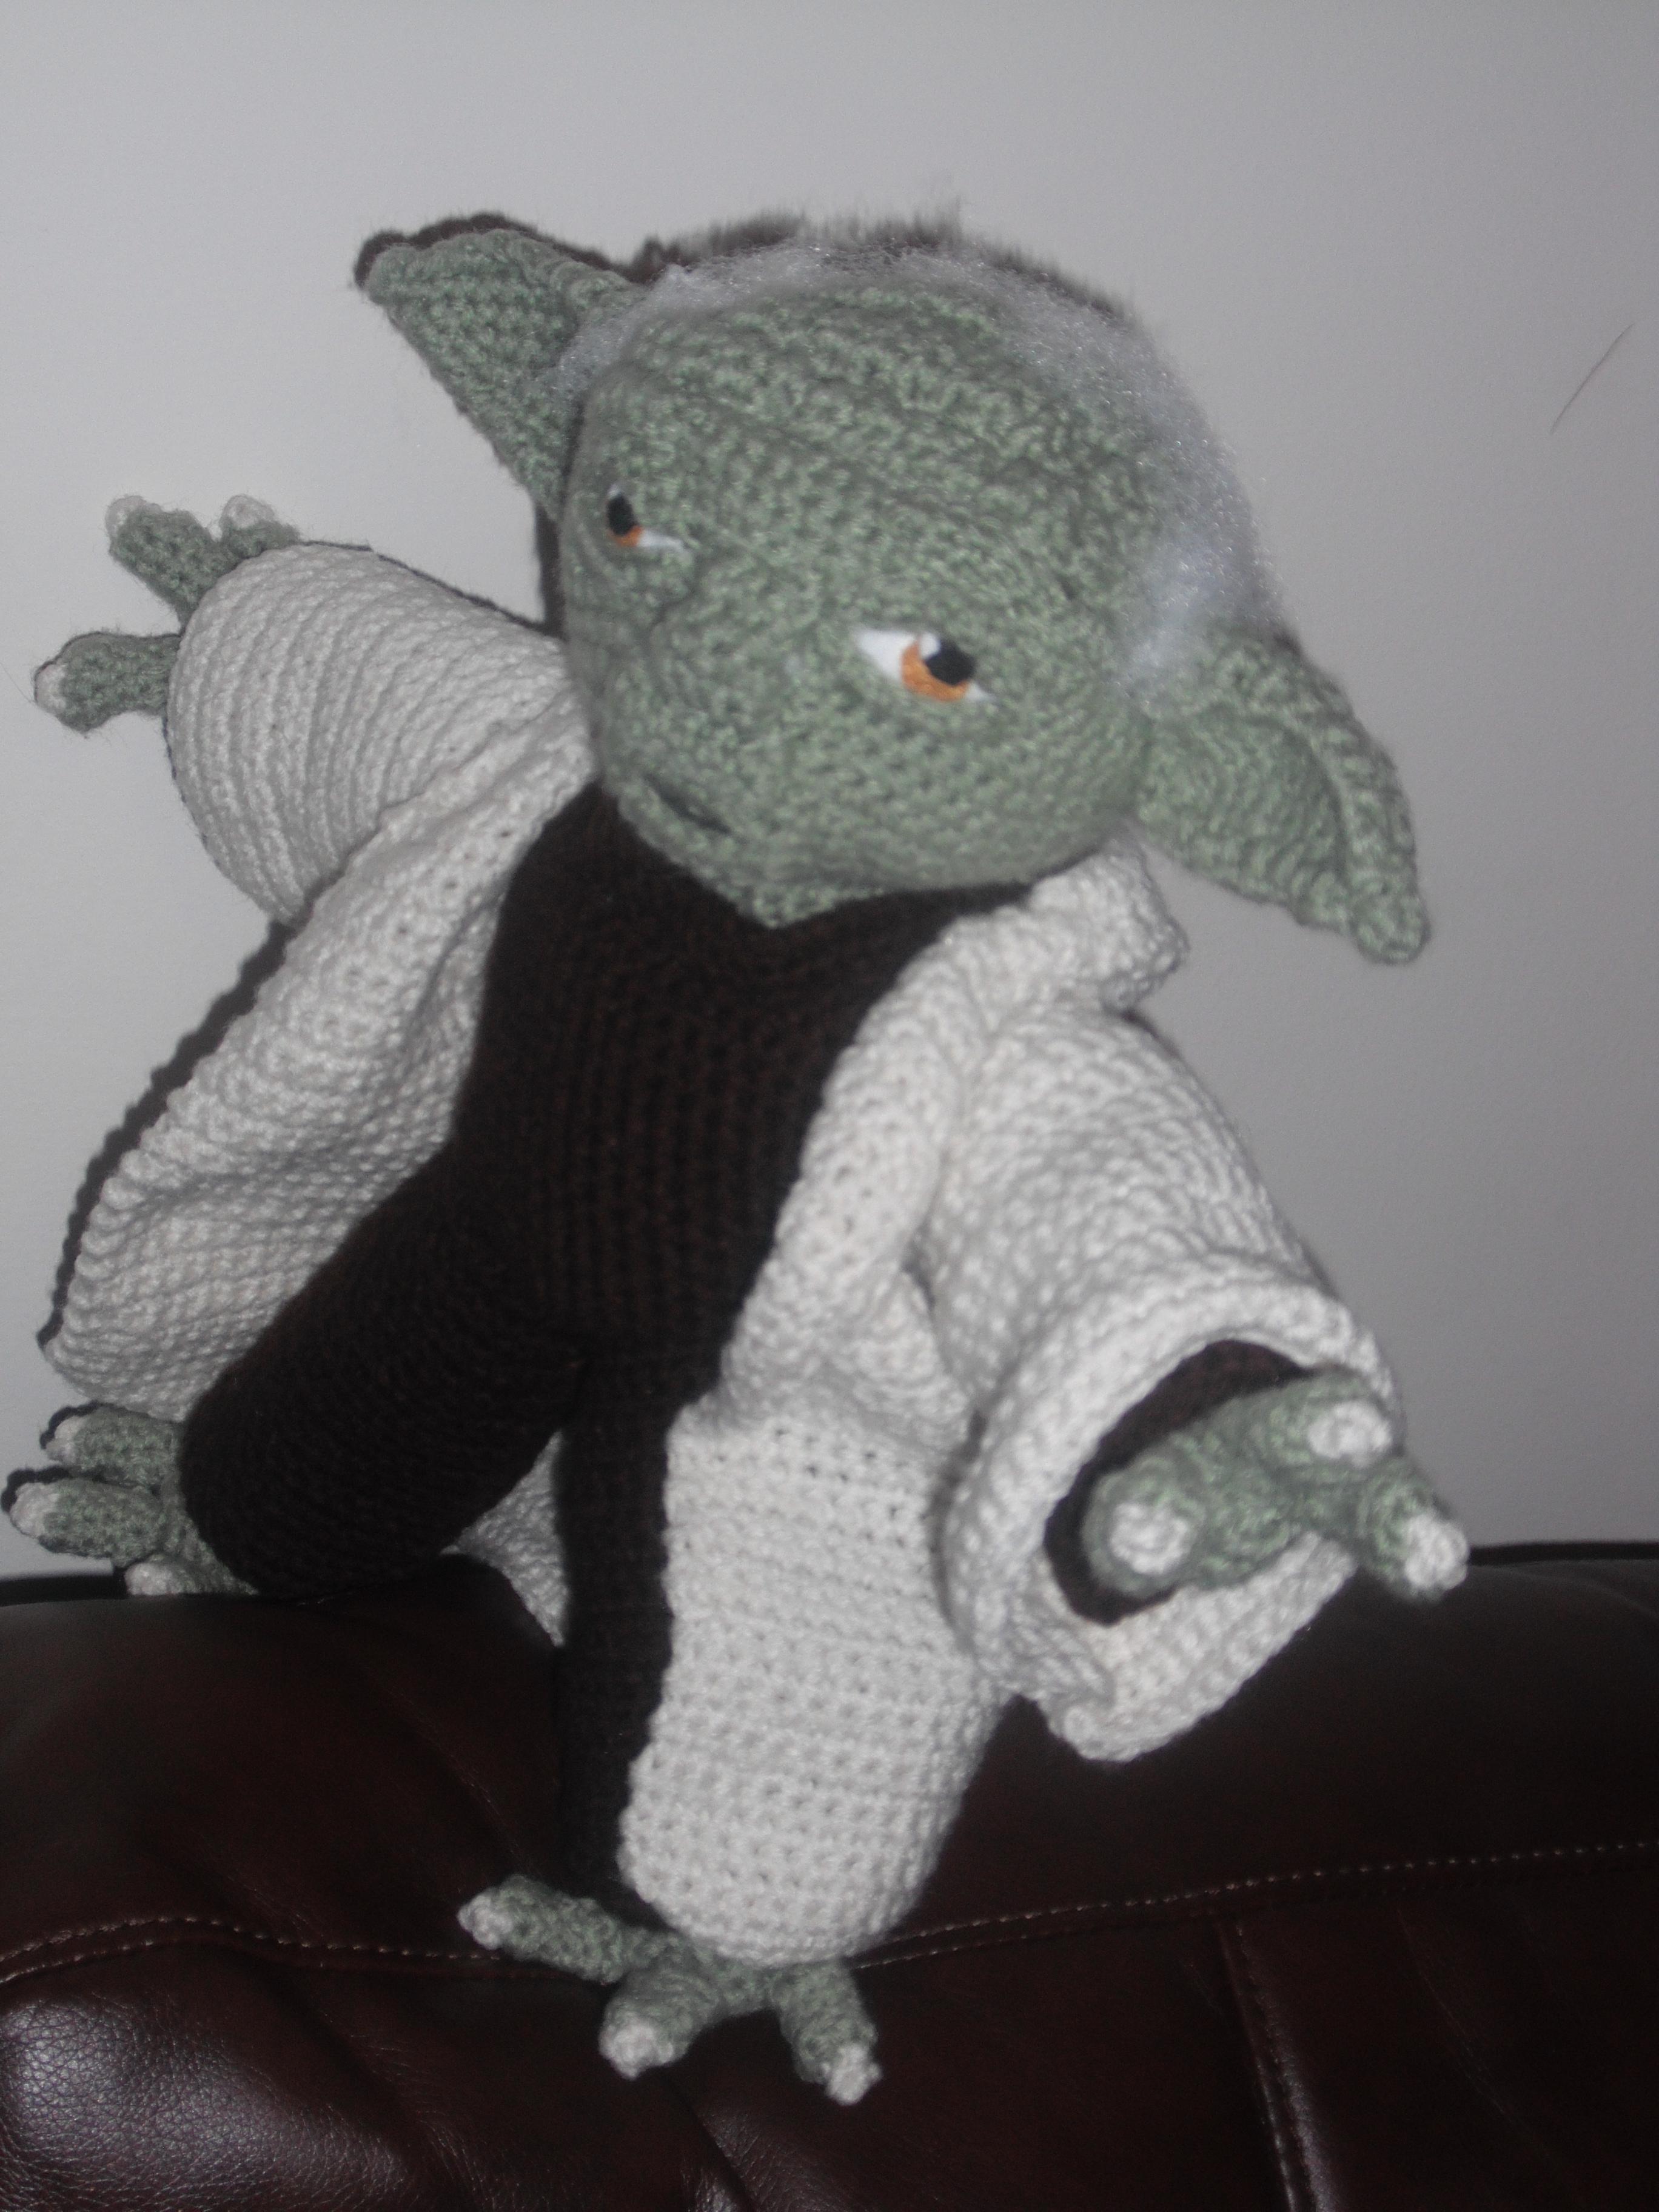 Yoda amigurumi pattern by Ingrid van Donkelaar | Star wars crochet ... | 3648x2736